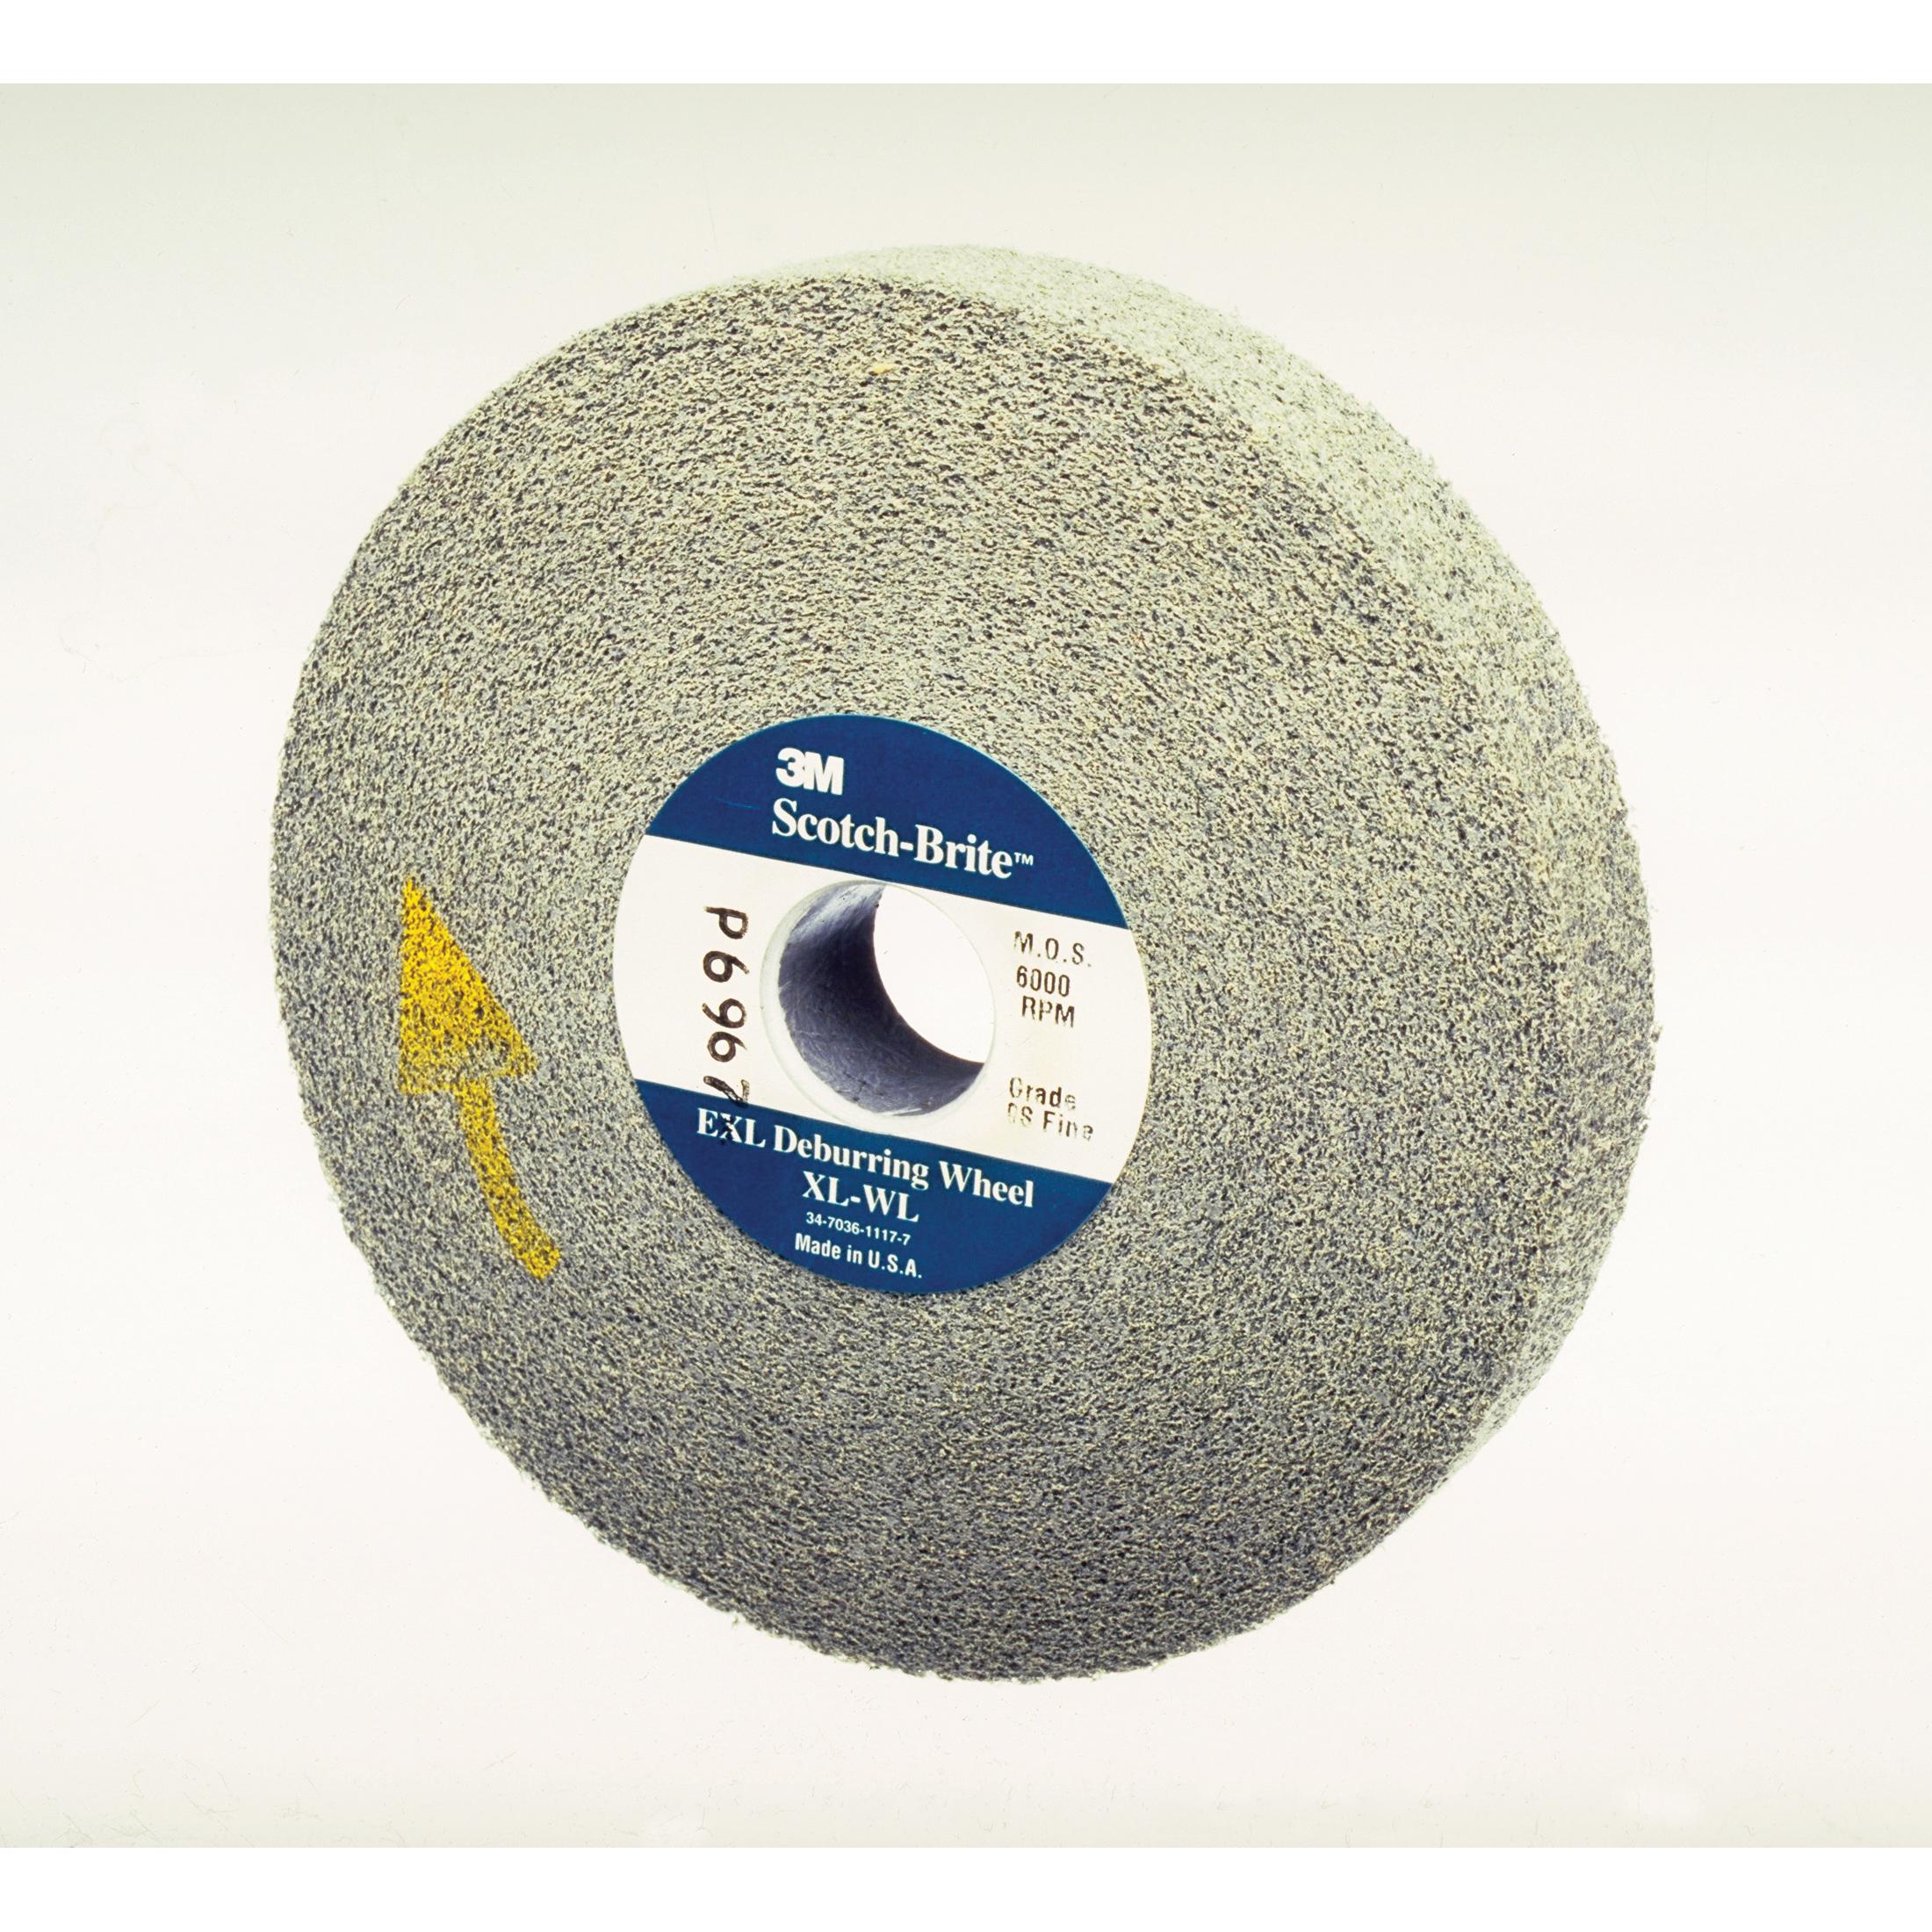 Scotch-Brite™ 048011-01569 CP-UW Cut and Polish Unitized Wheel, 2 in Dia Wheel, 1/4 in Center Hole, 3/4 in W Face, Fine Grade, Aluminum Oxide Abrasive